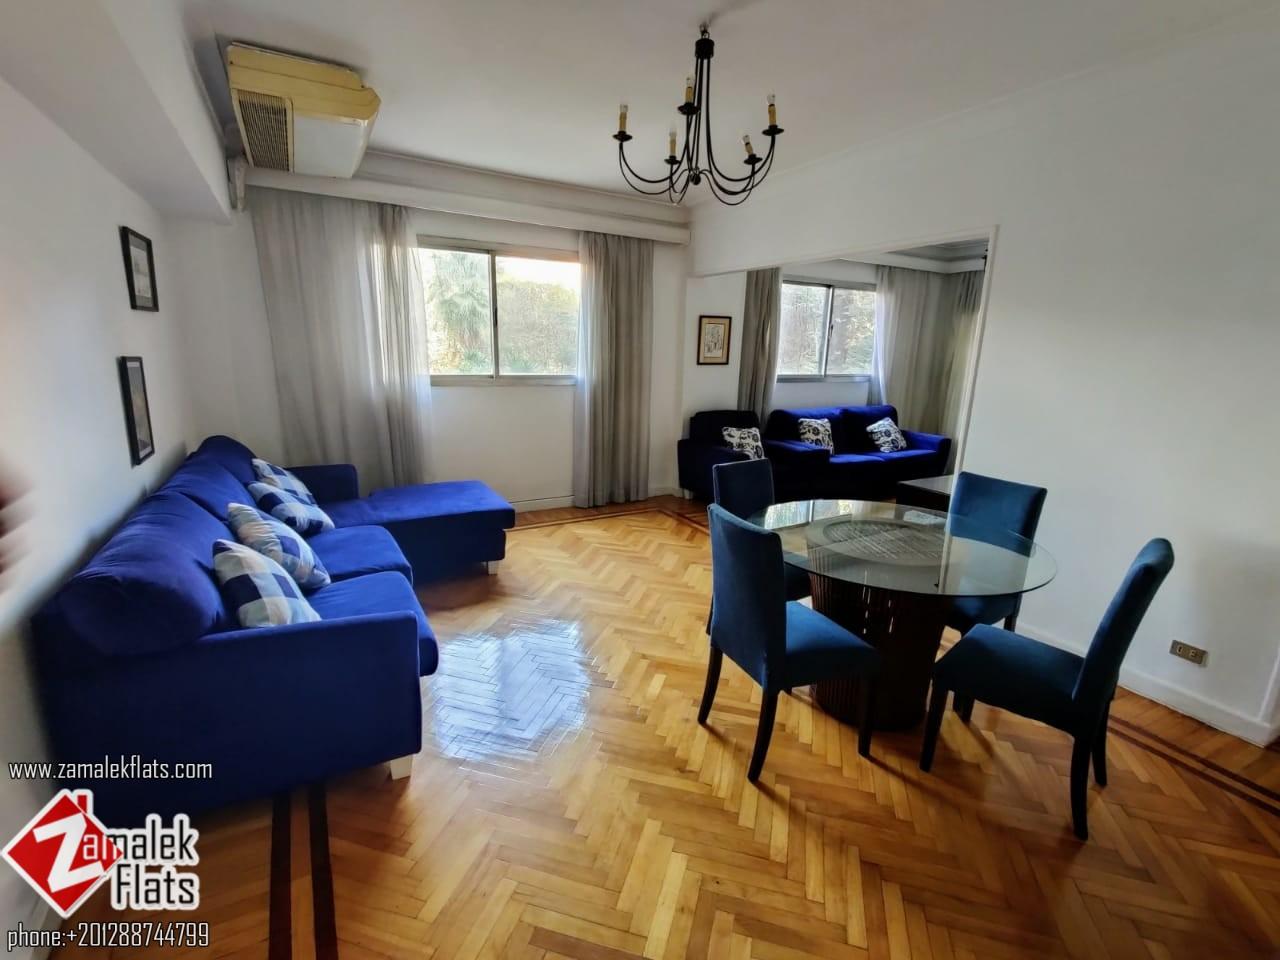 Renovated Apartment For Rent In Zamalek